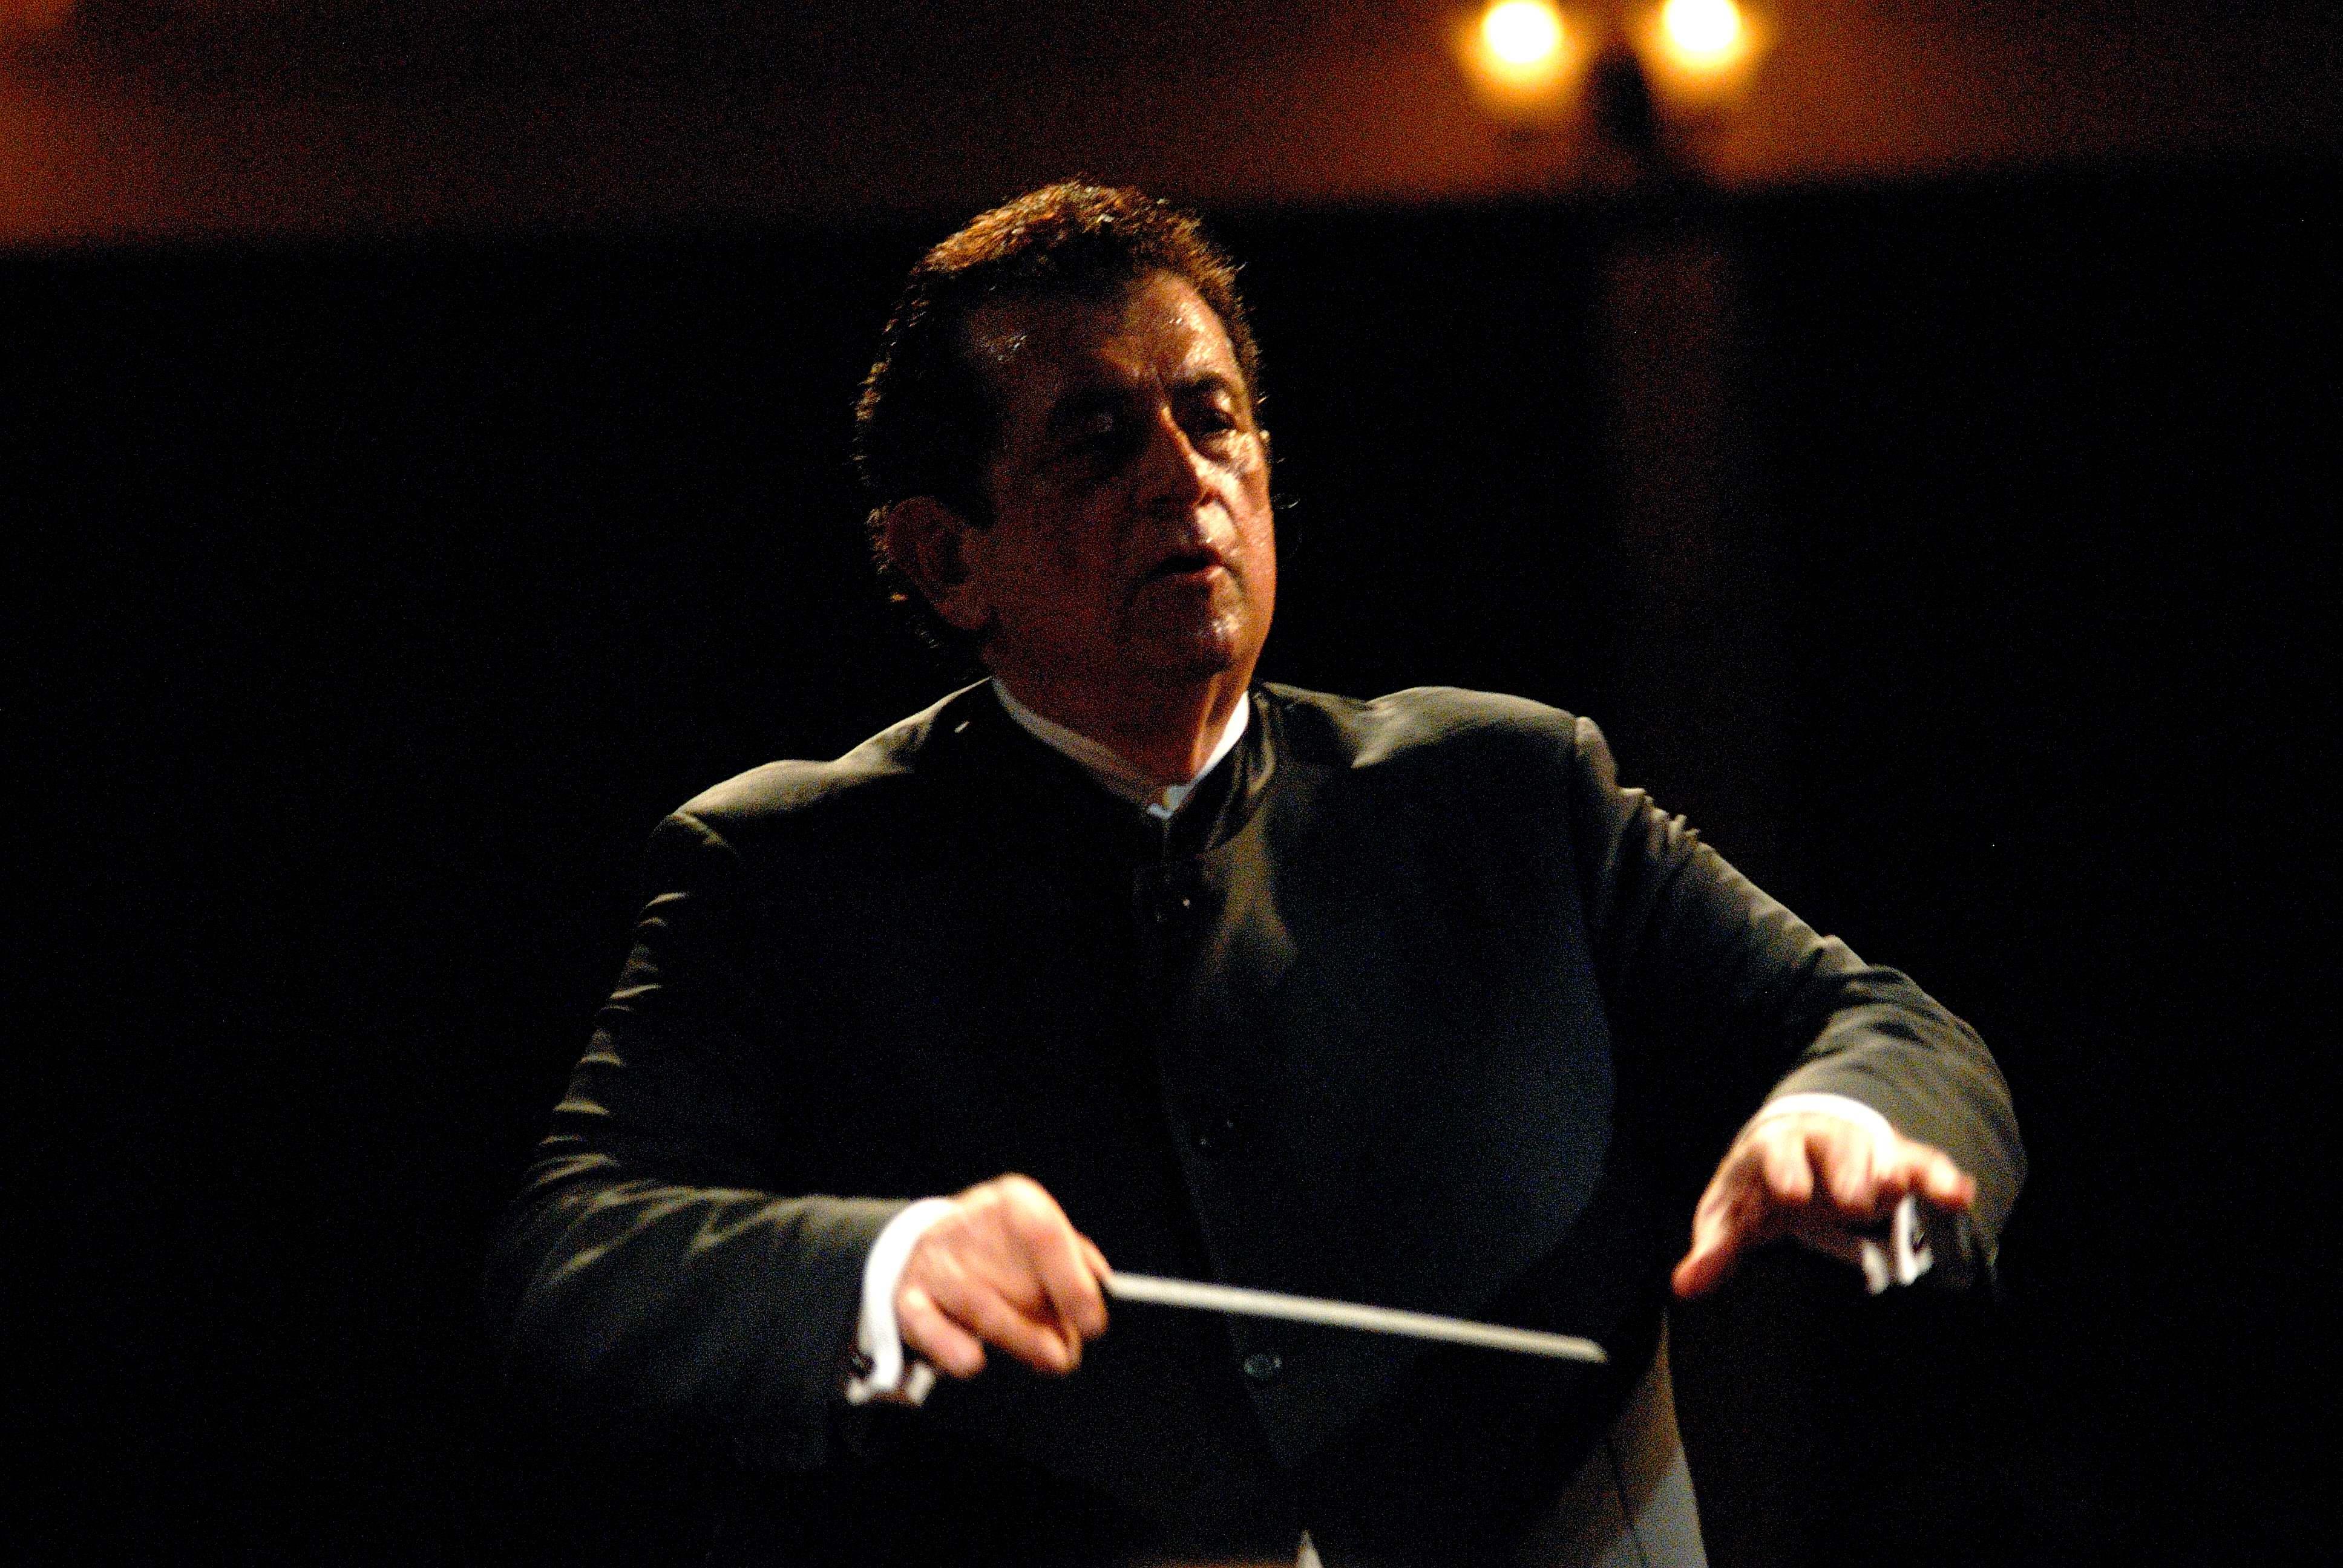 Peter Tiboris Conducting at Festival of the Aegean in 2007